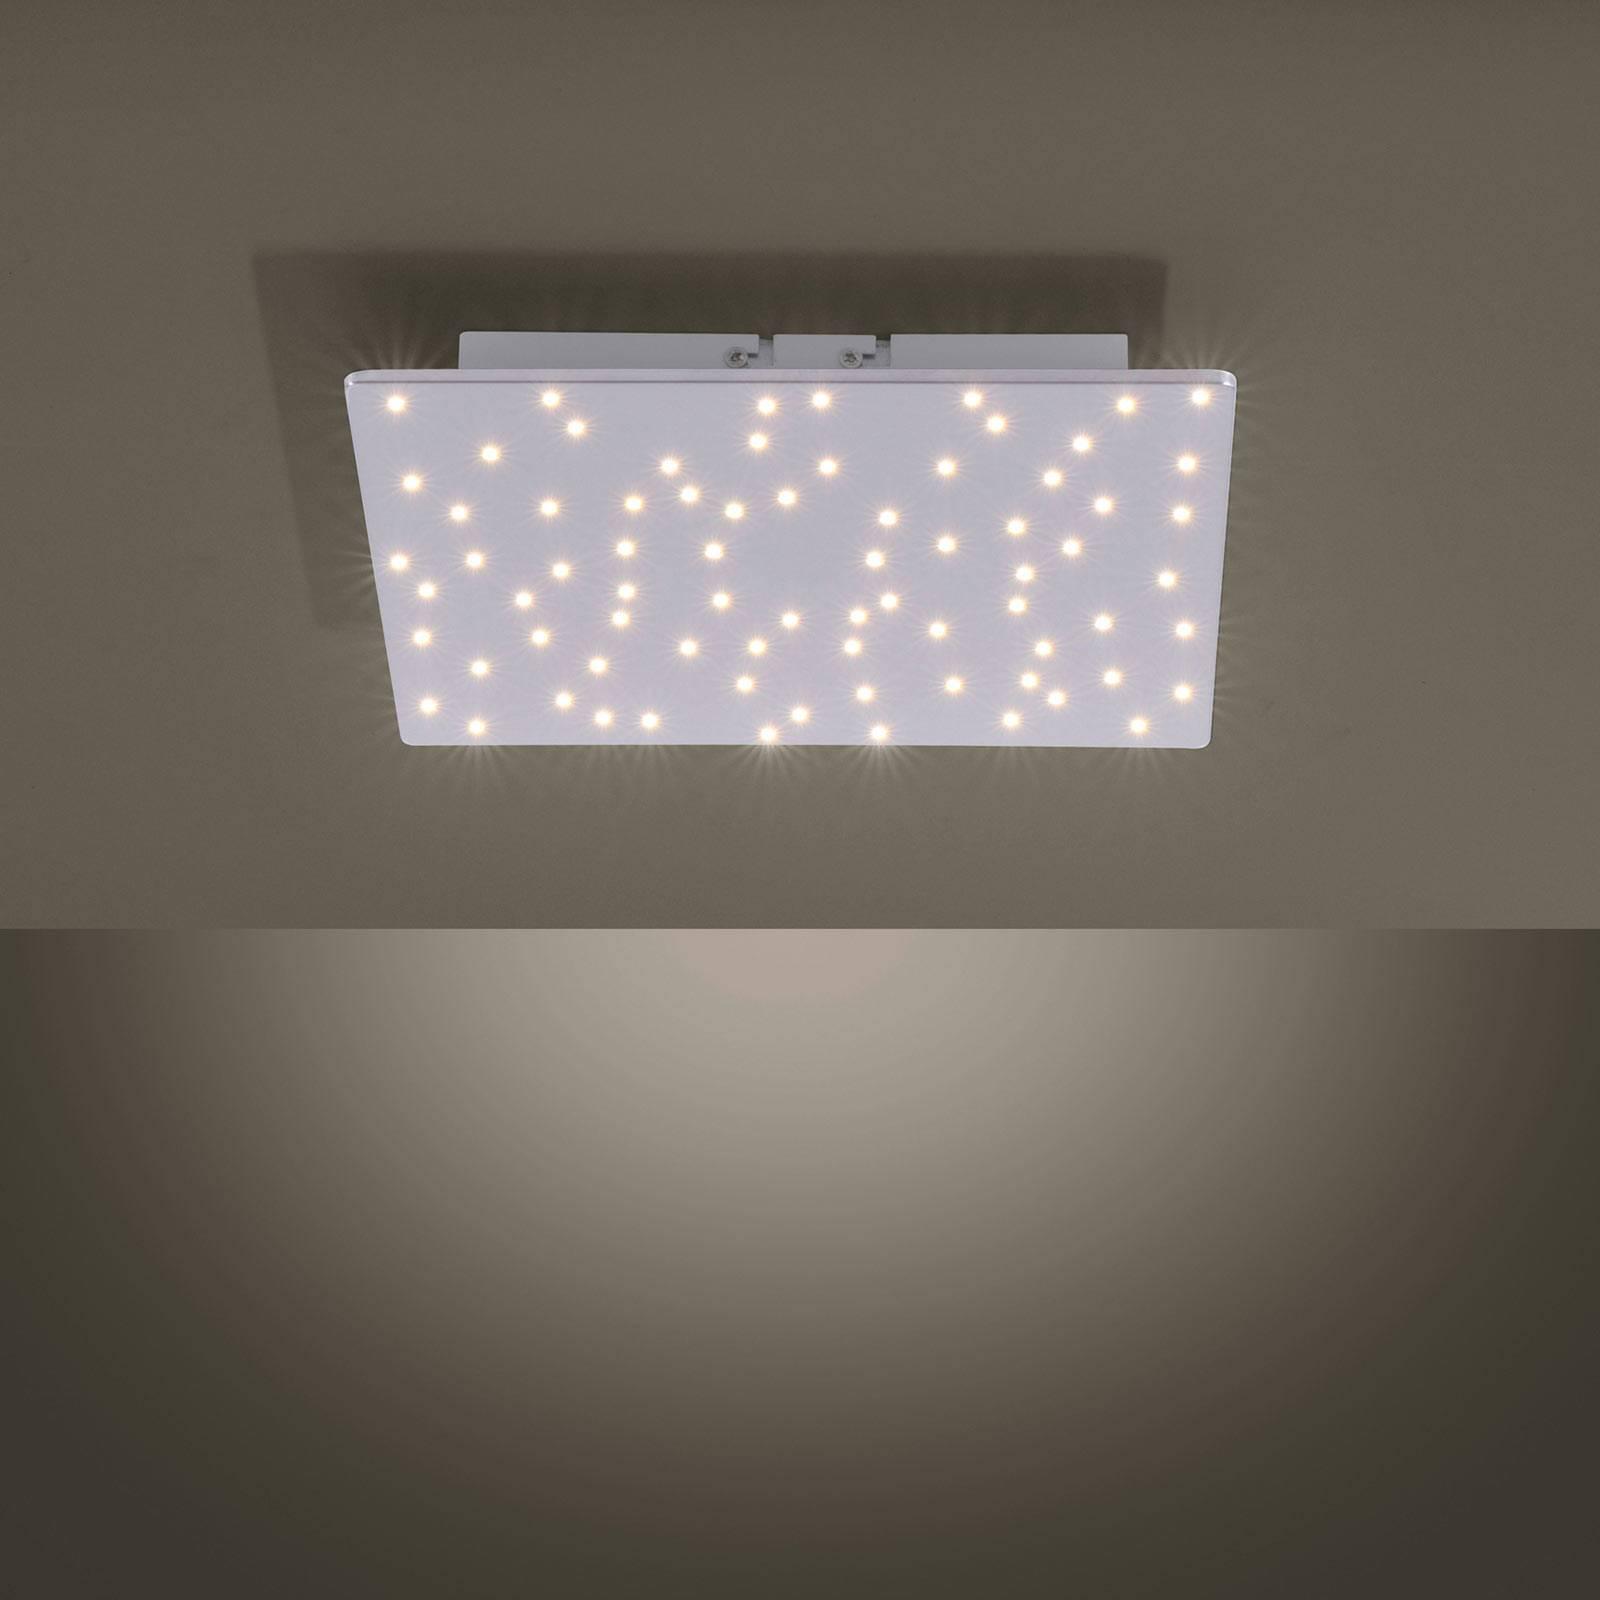 LED-Deckenleuchte Sparkle, tunable white, 30x30 cm